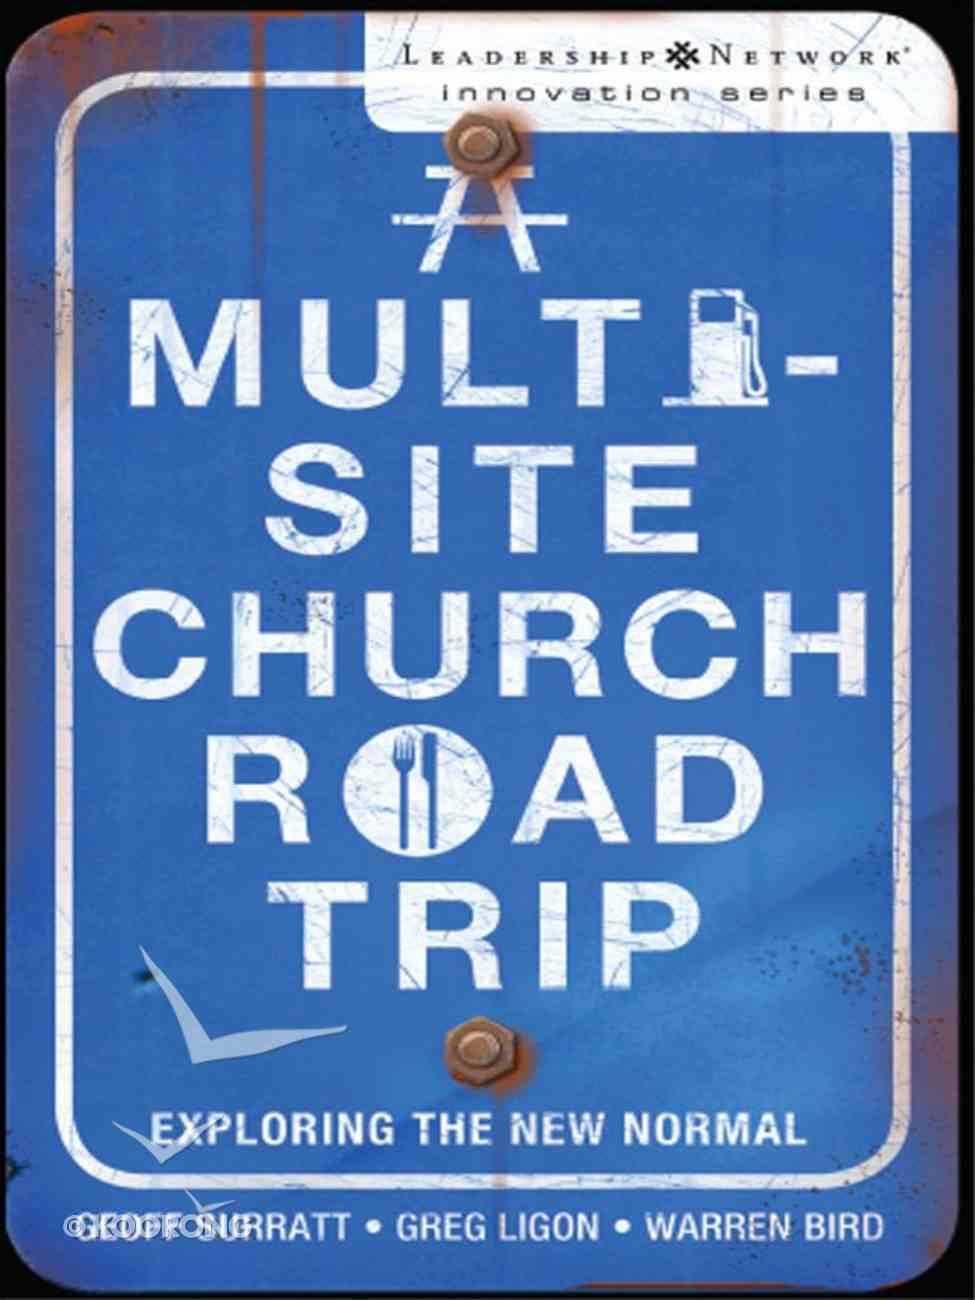 A Multi-Site Church Roadtrip (Leadership Network Innovation Series) eBook